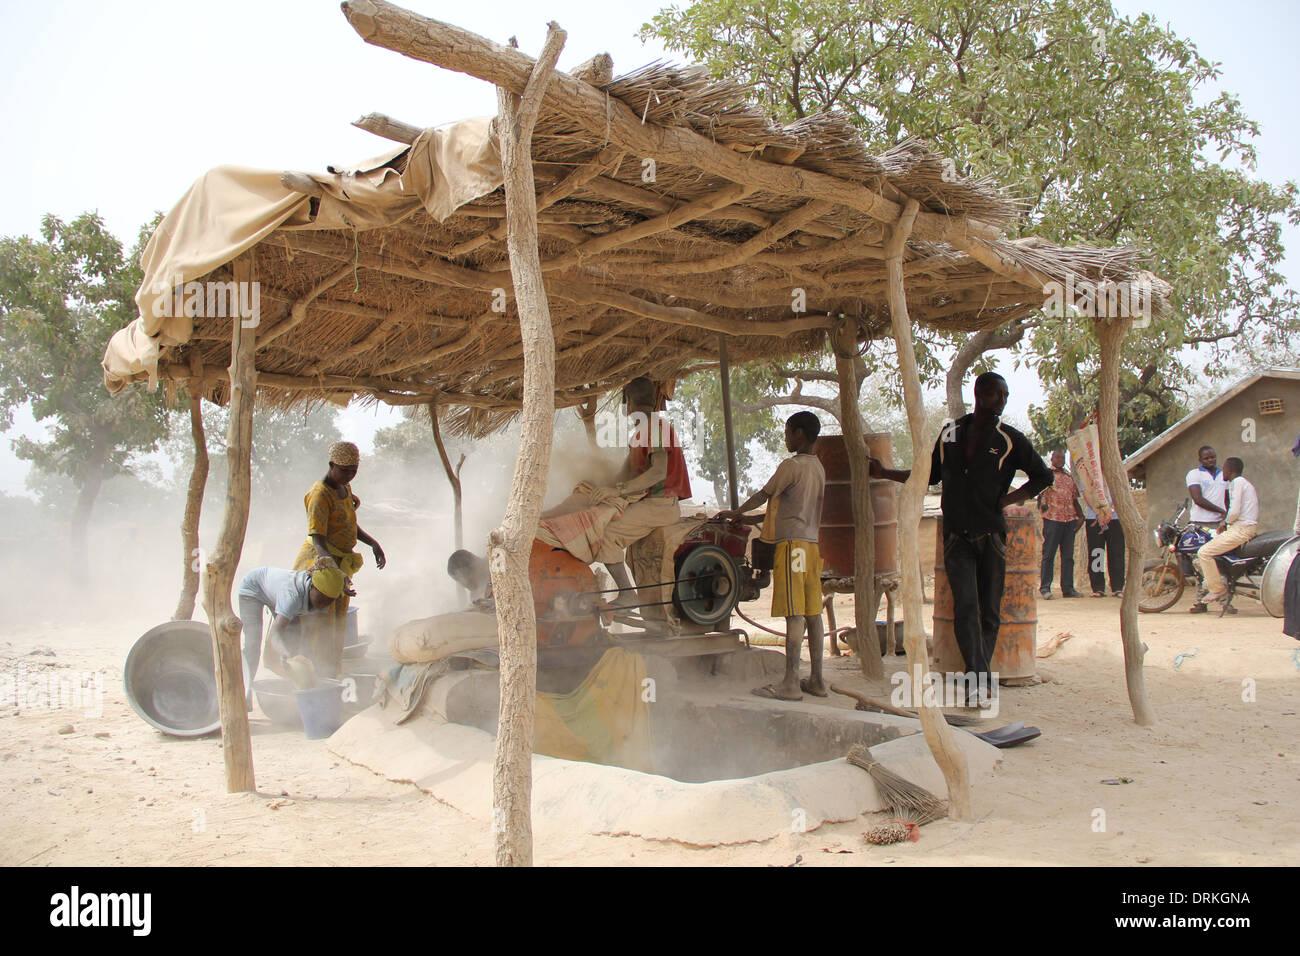 Working in village workshops; Ghana - Stock Image